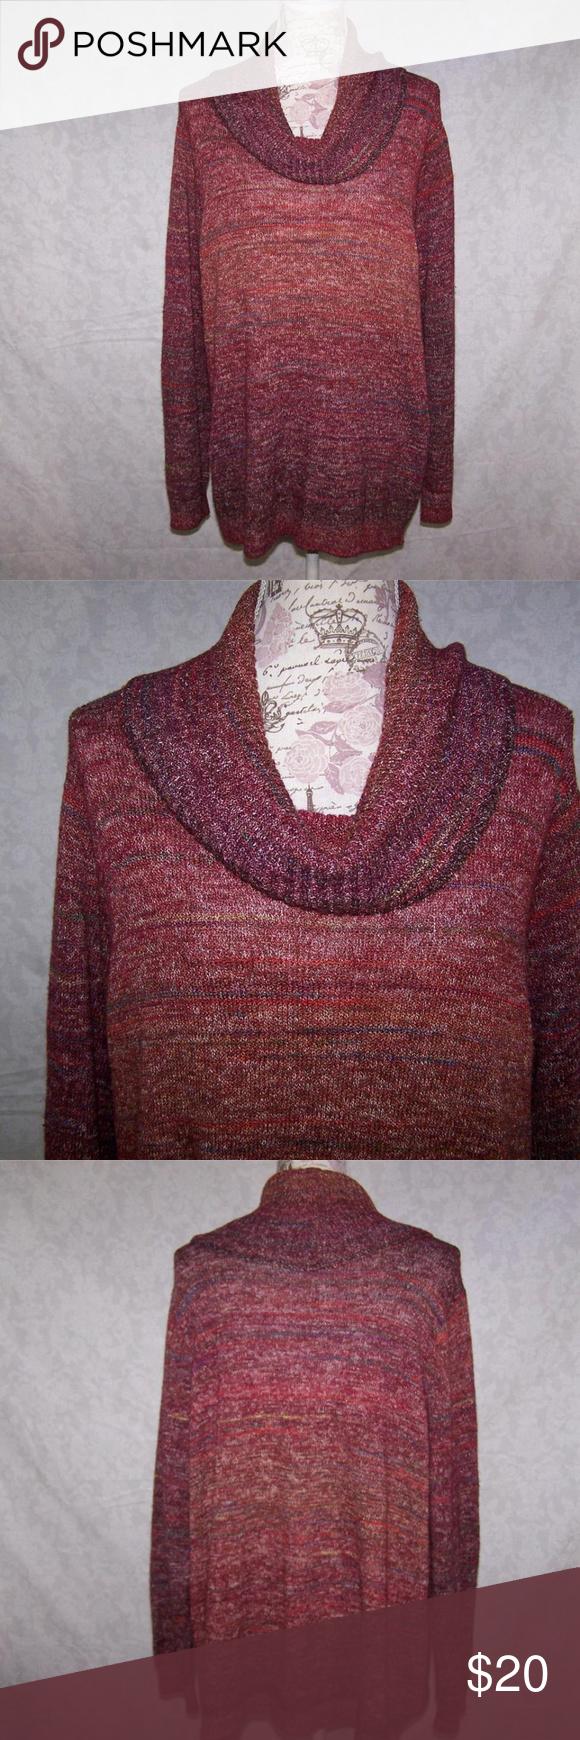 89th Madison Sweater Top Plus 3x Cowl Neck Pinterest Cowl Neck